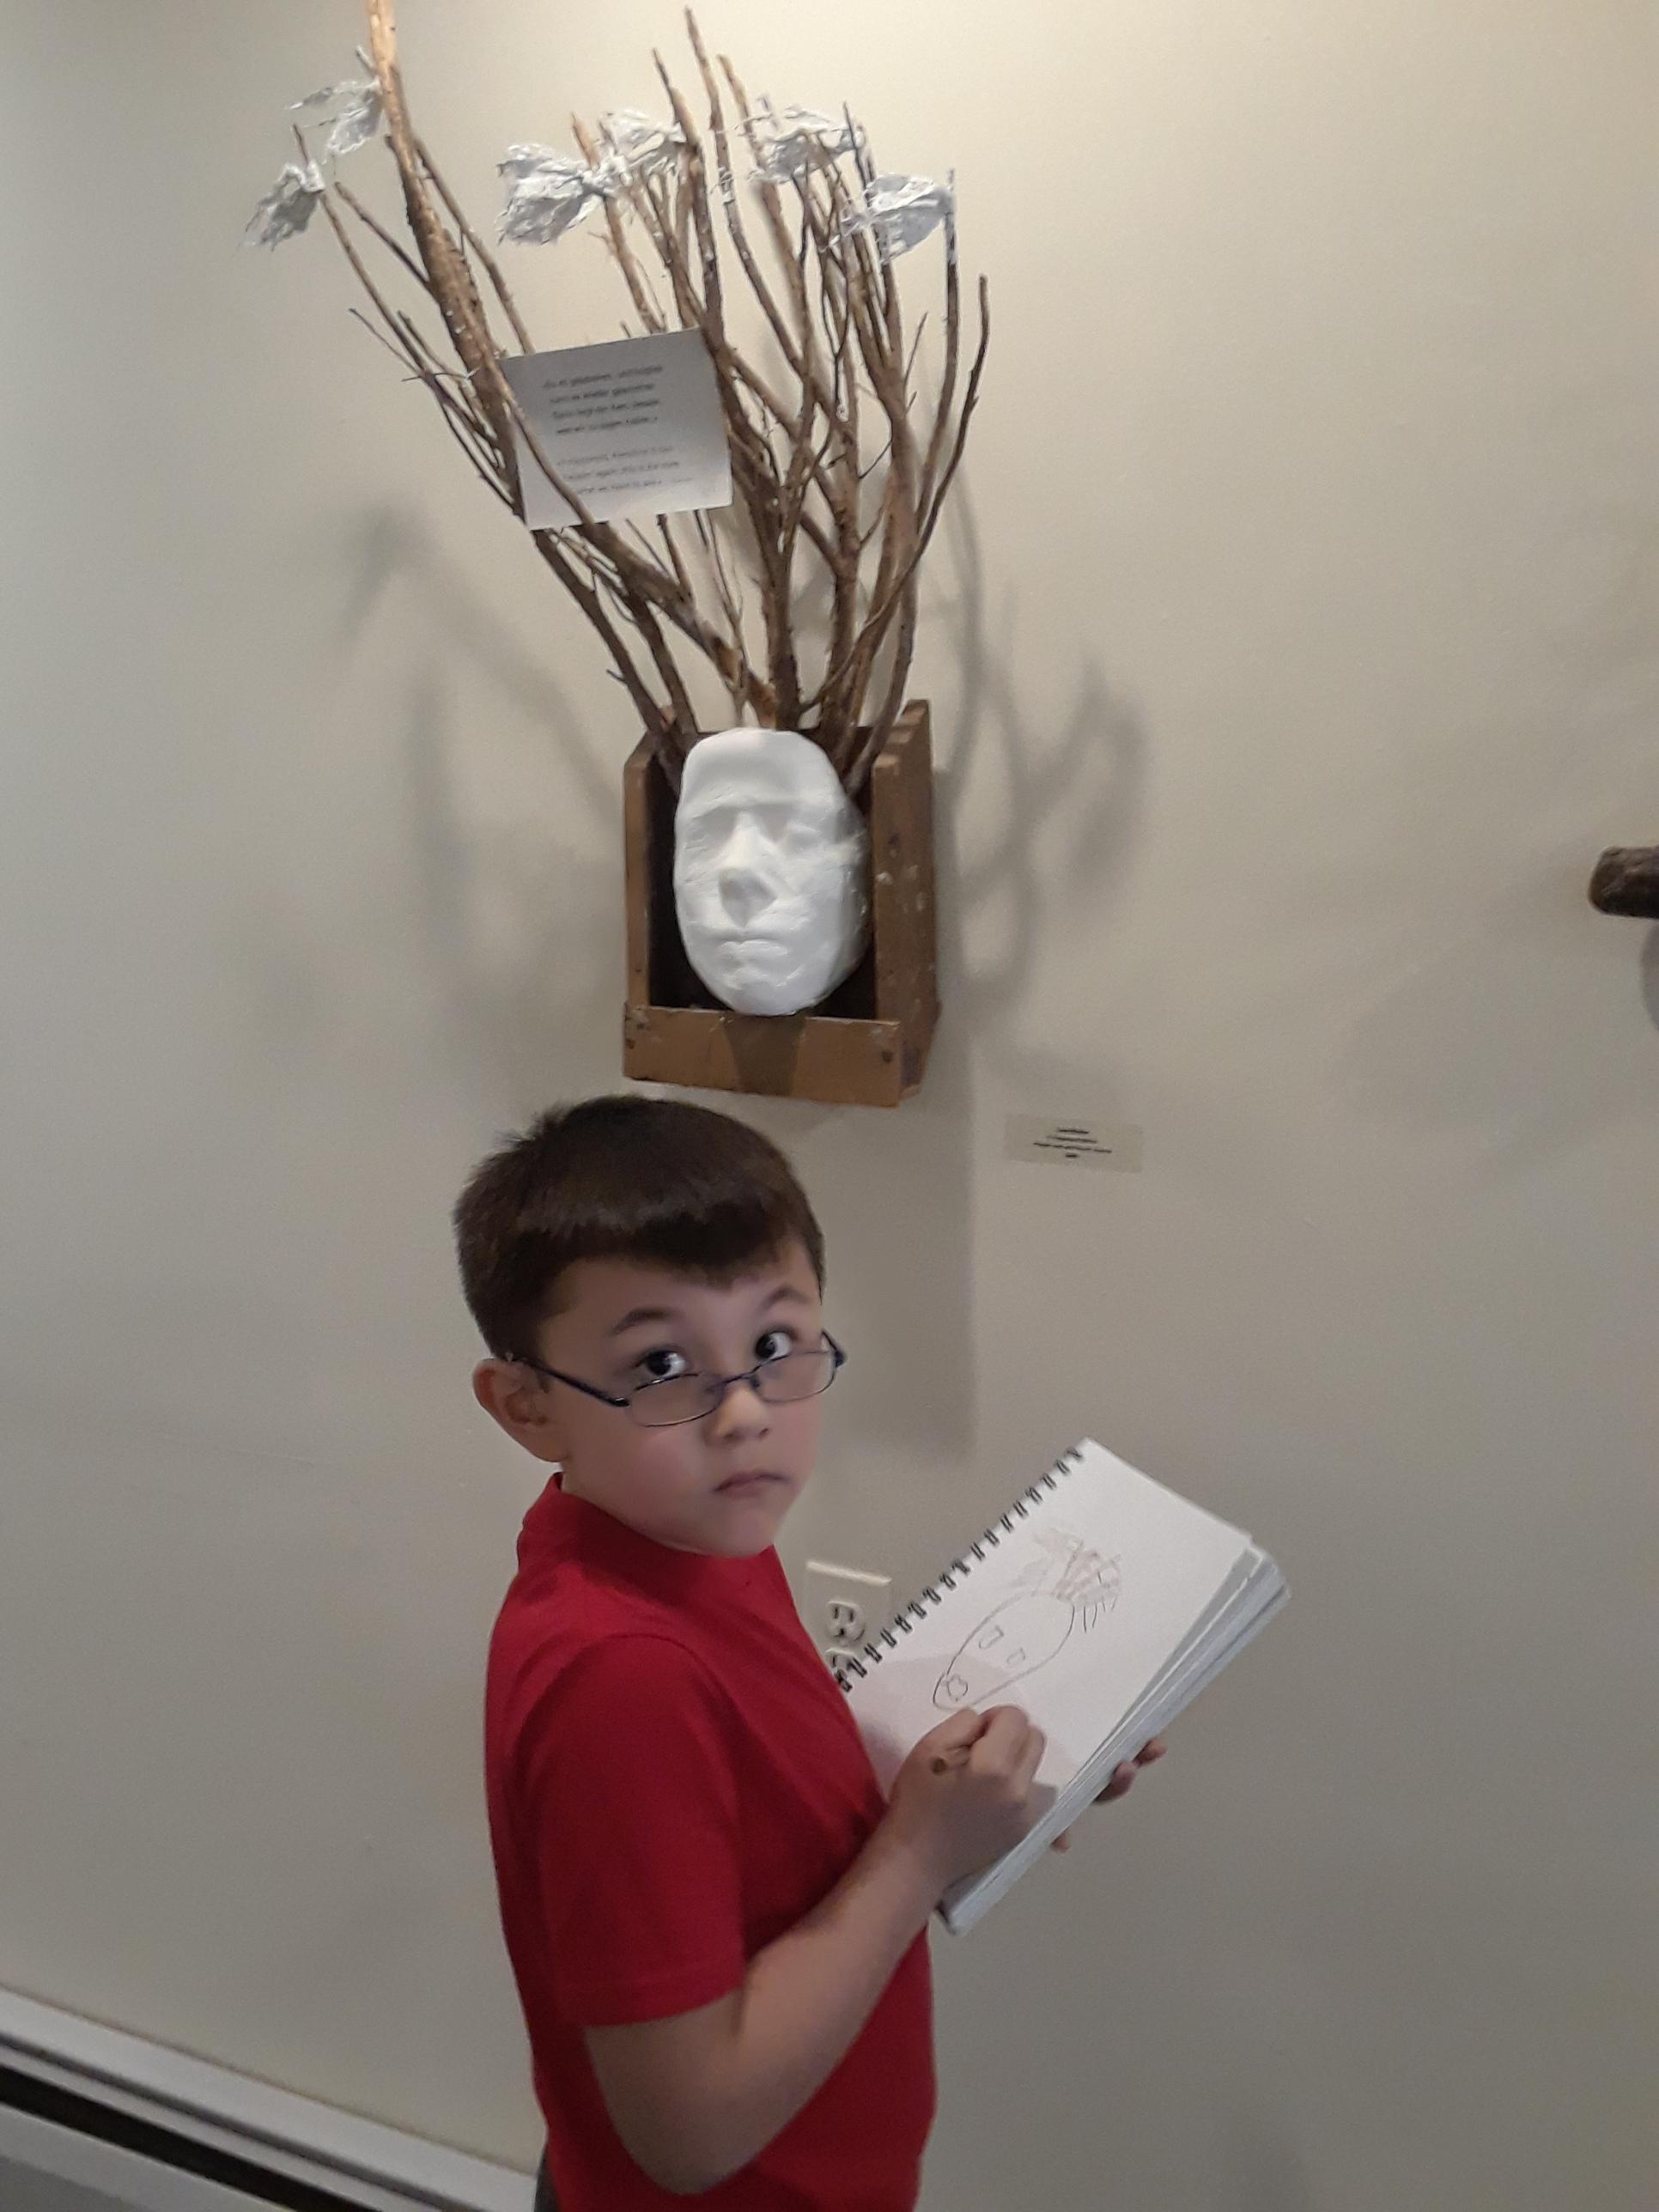 Gallery visit to Queen City 15